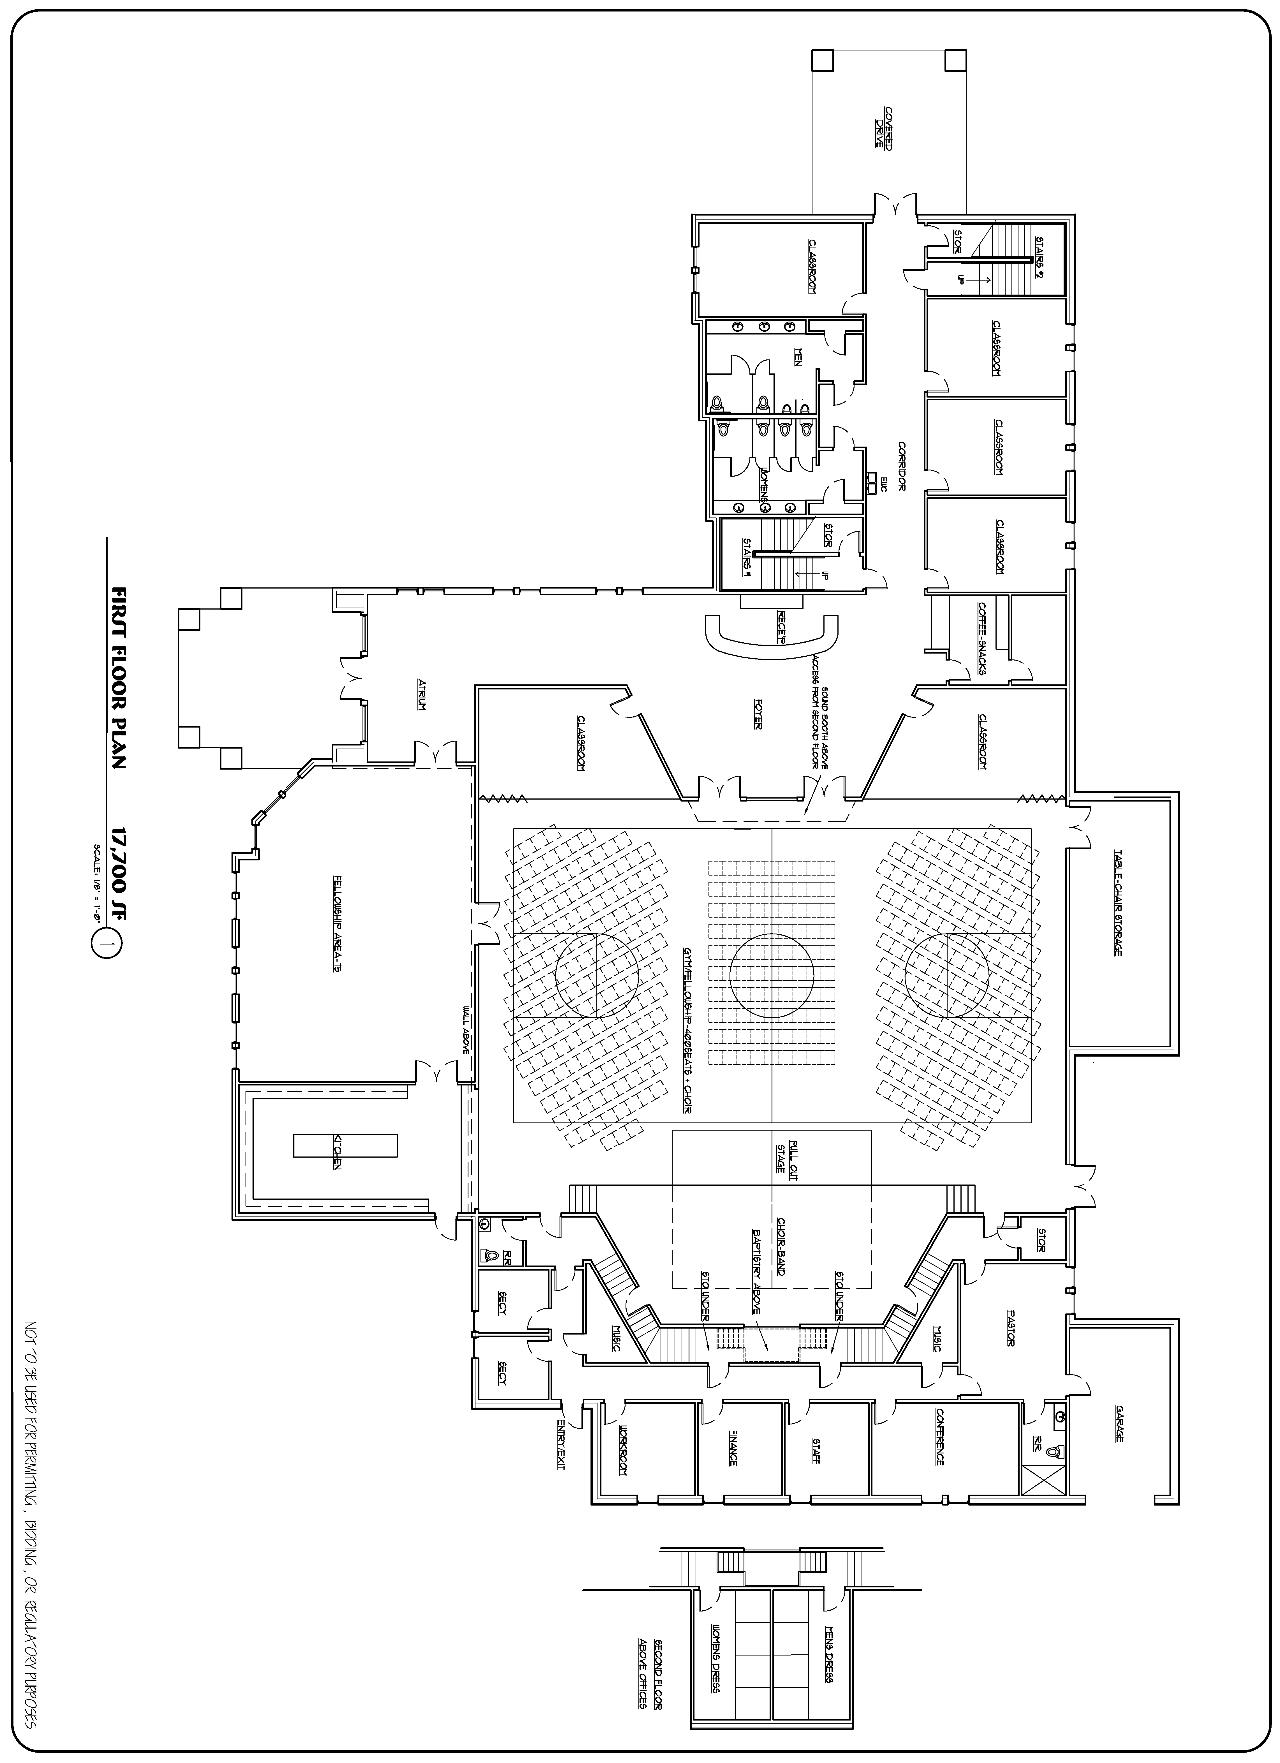 El Bethel Baptist Church Architectural Floor Plan